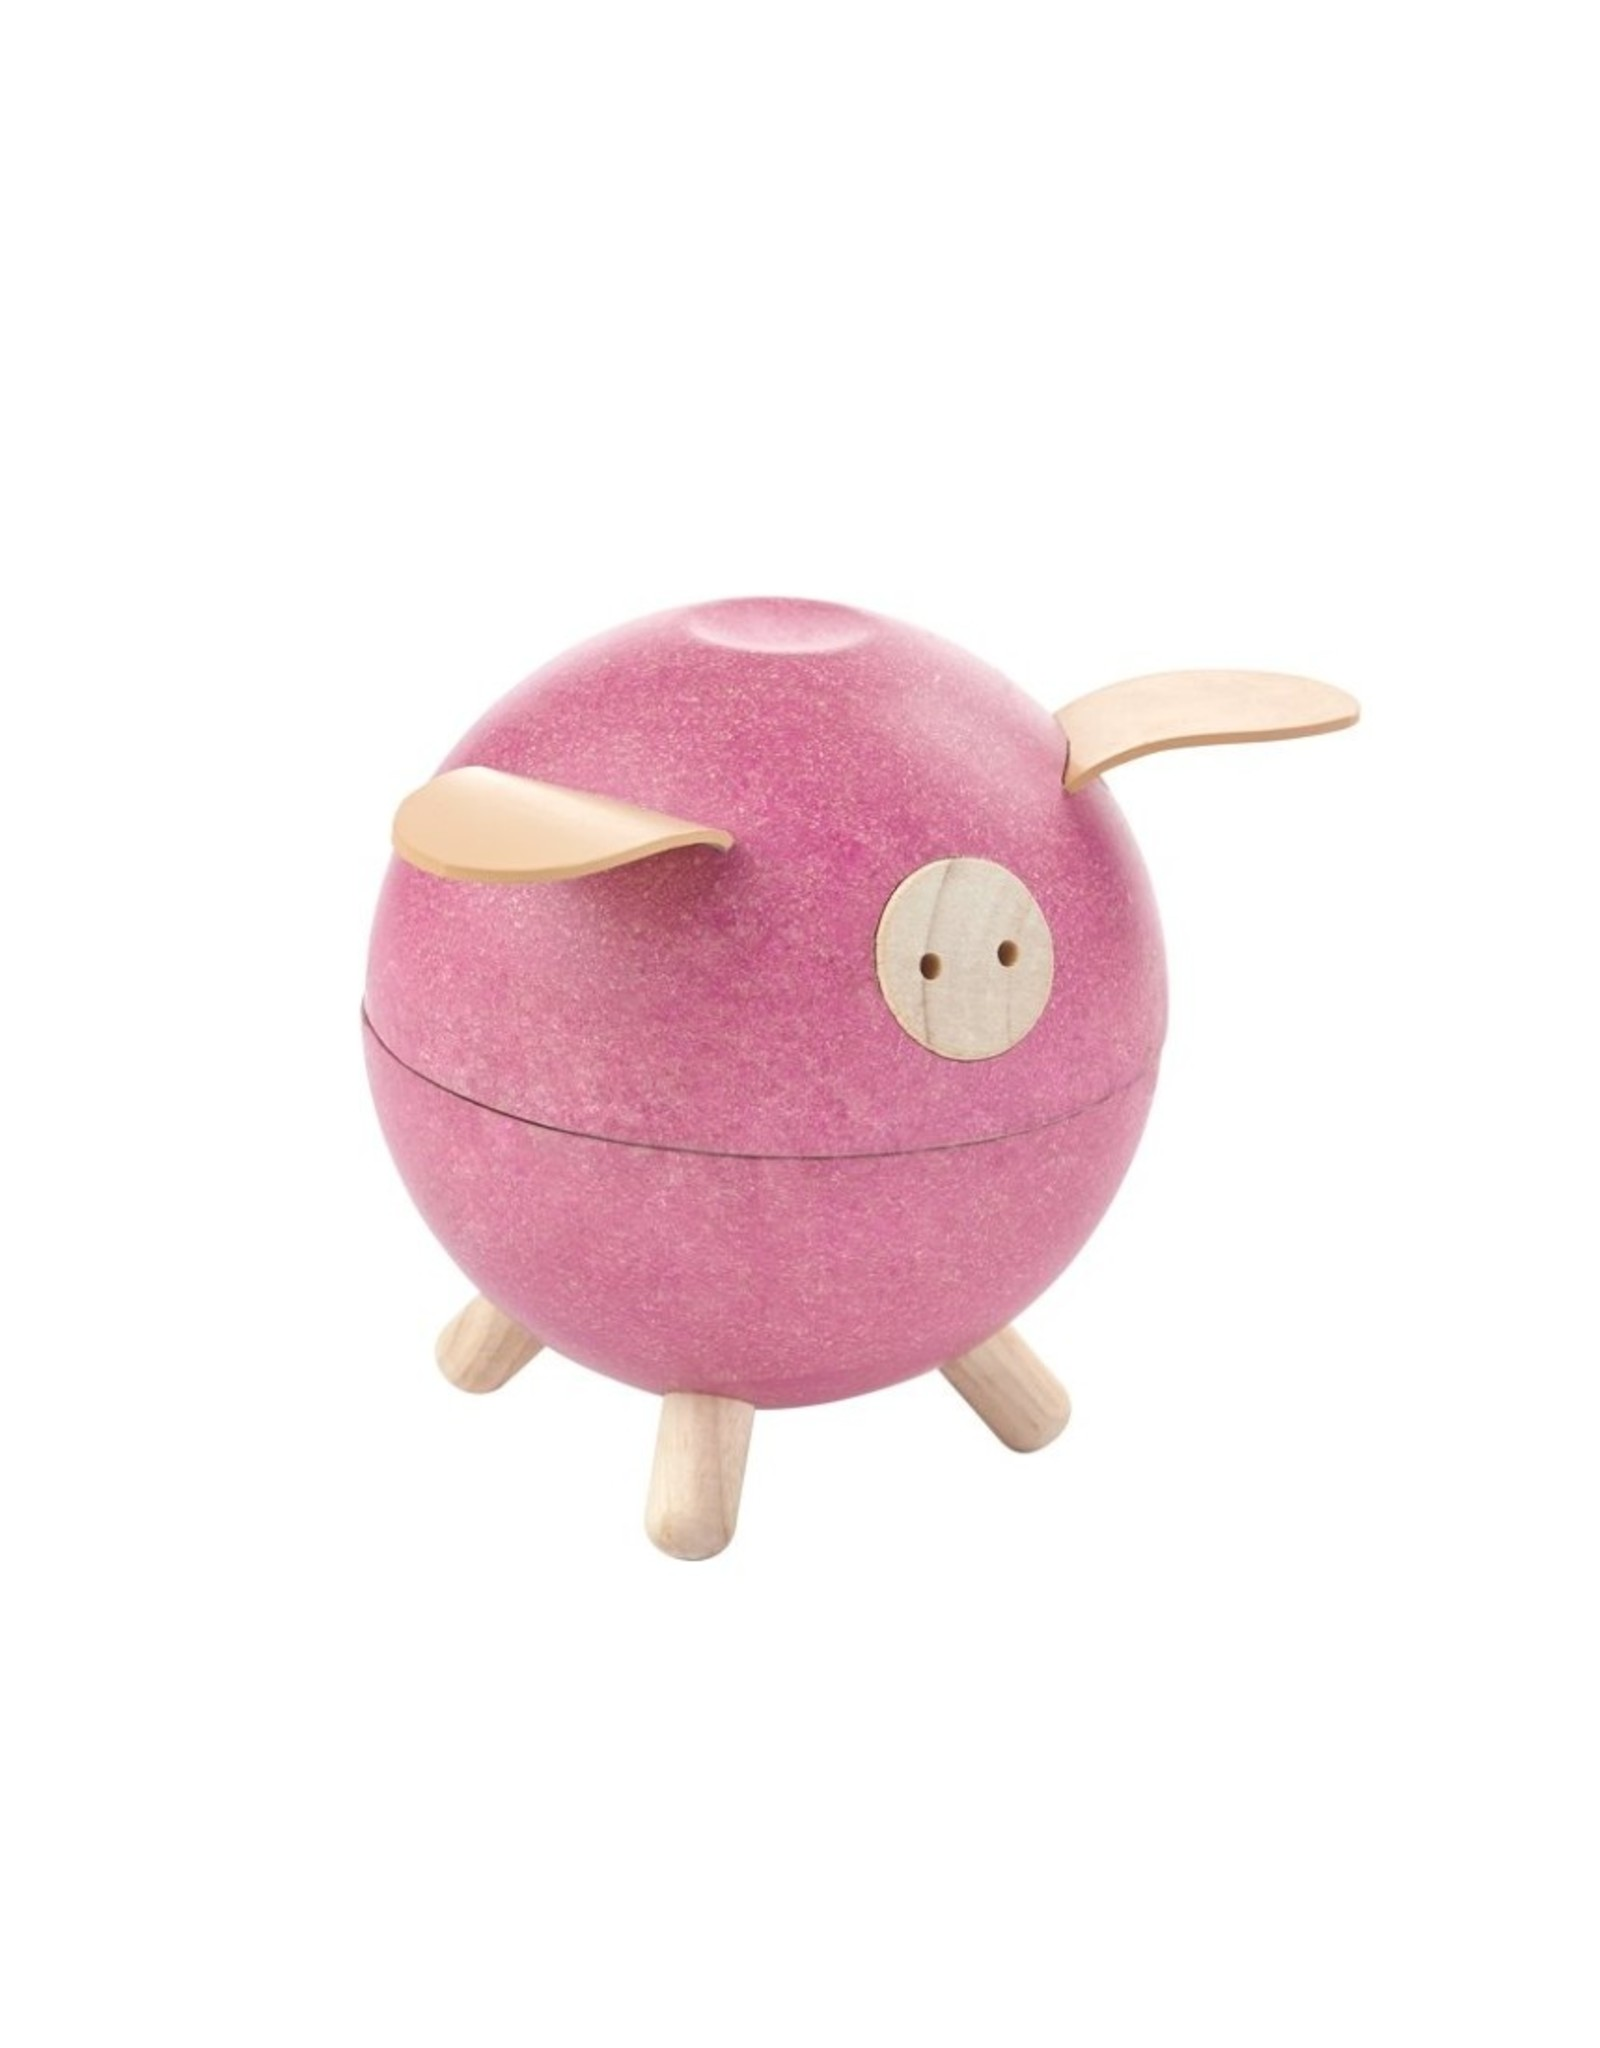 Plan Toys Kidsdepot - SPAARPOT - ROZE